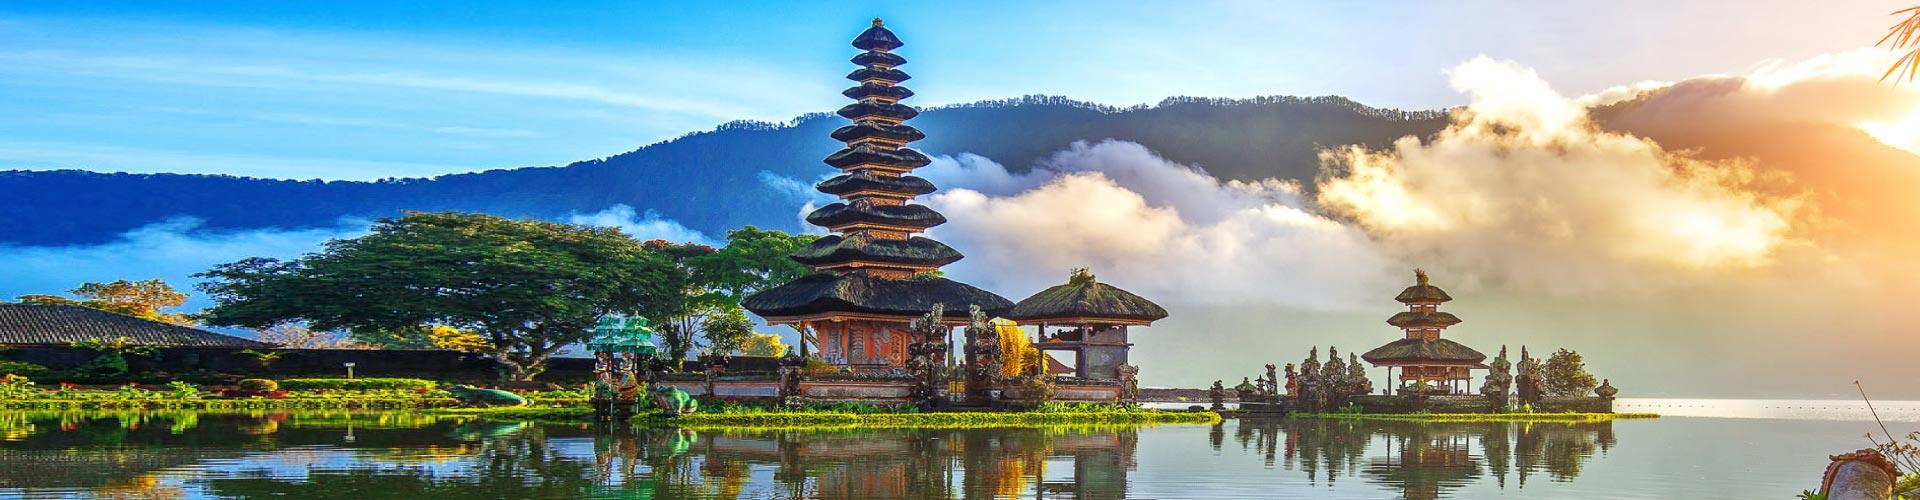 Bali, Lombok